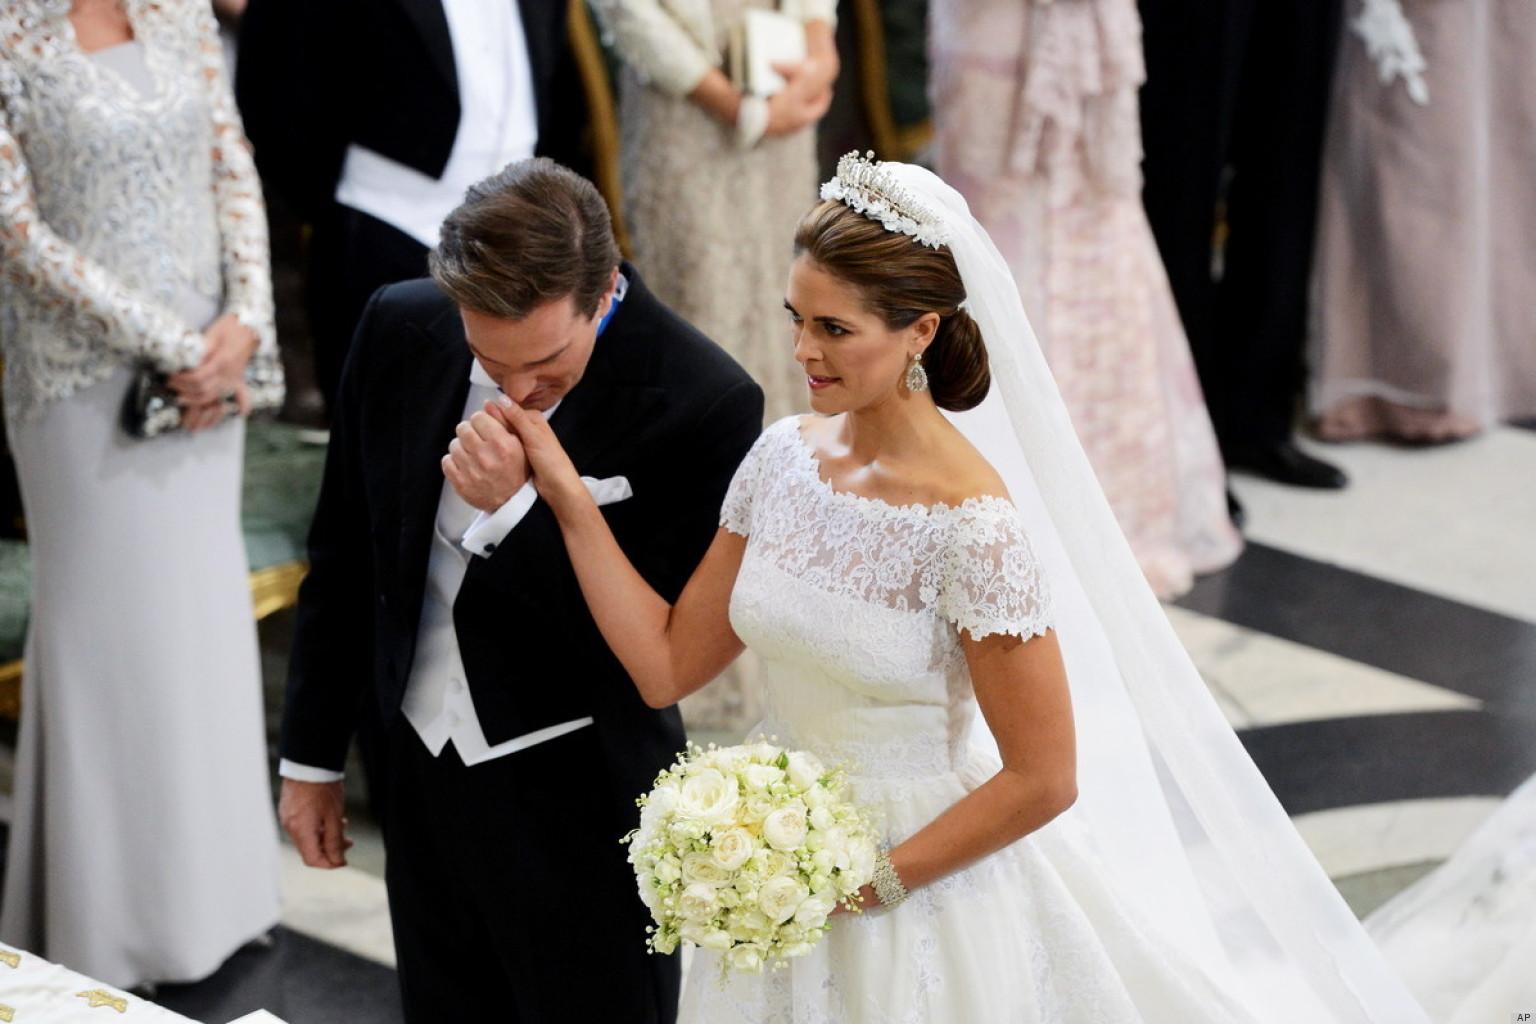 Swedish Royal Wedding See All The Regal Glitz PHOTOS